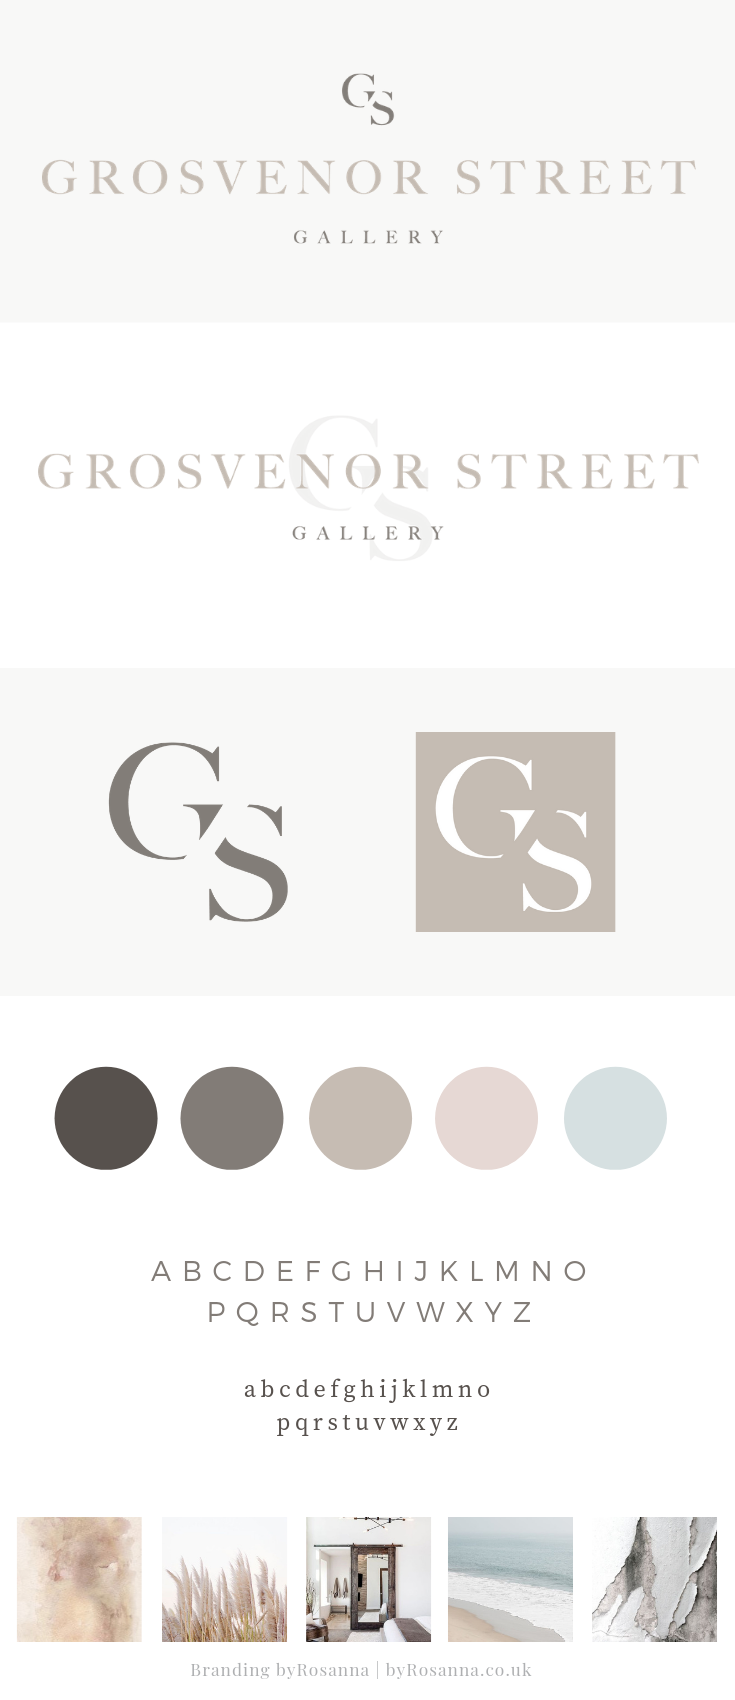 Minimal sophisticated brand design byRosanna